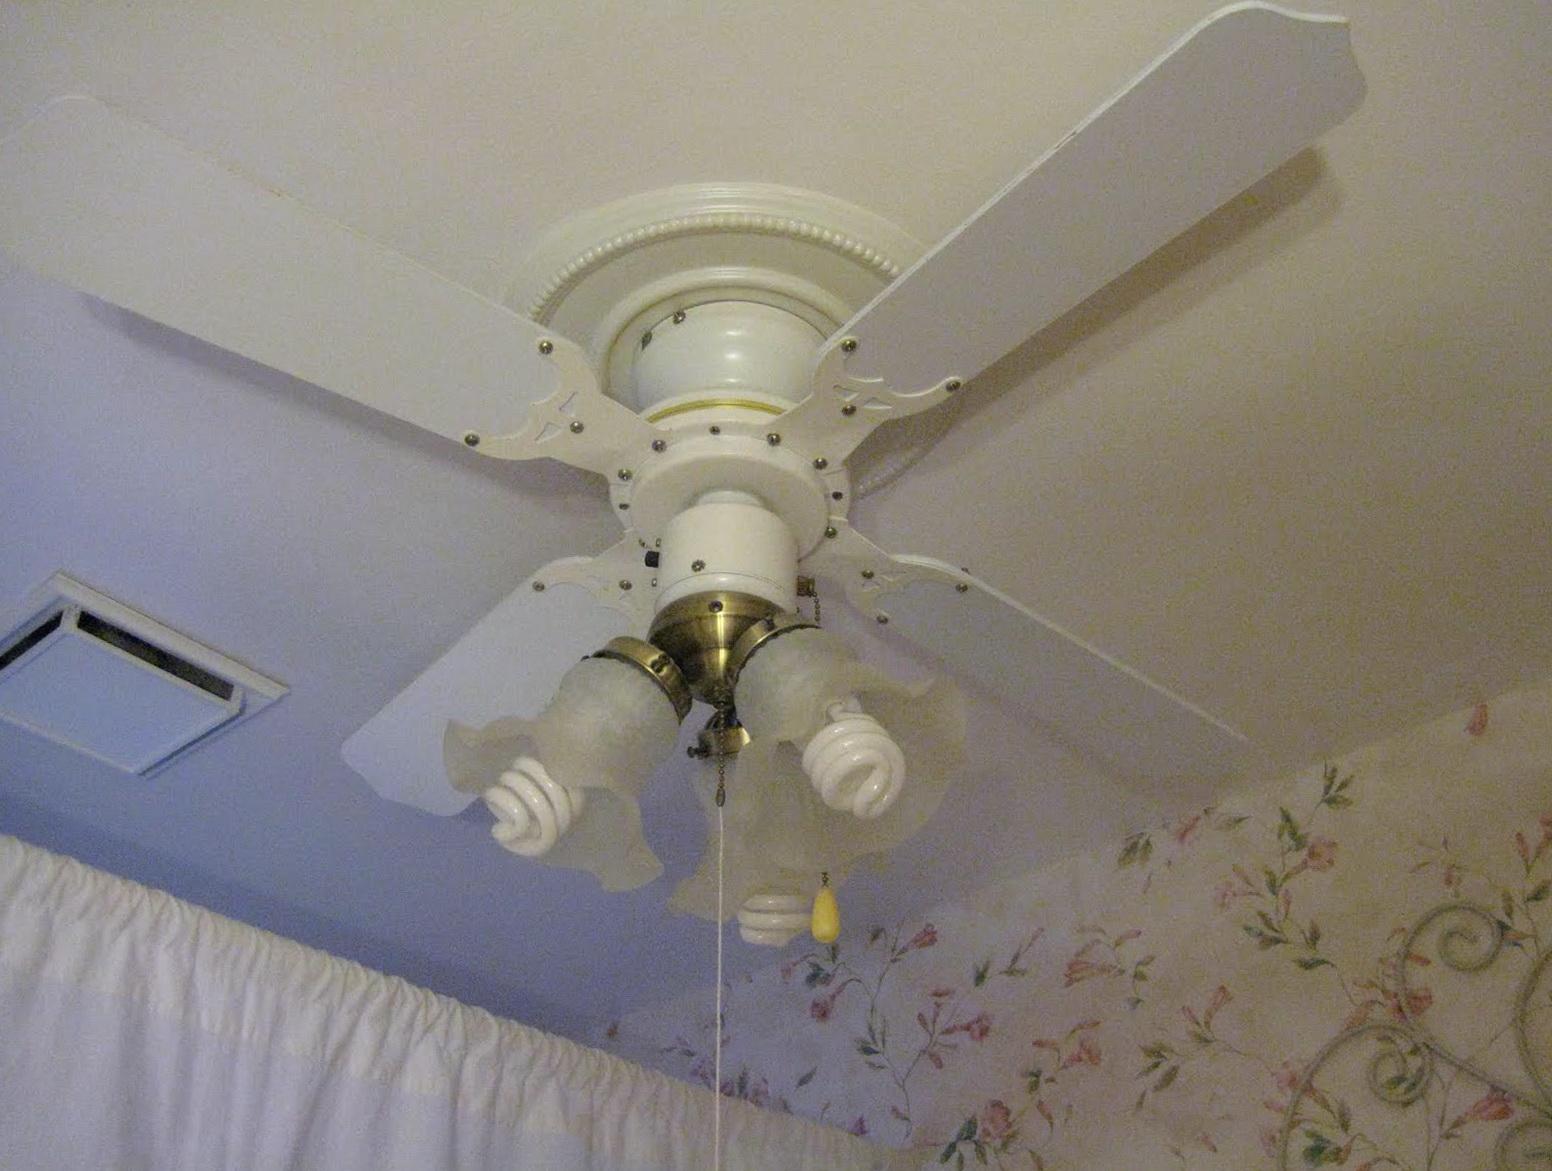 Chandelier Style Ceiling Fans